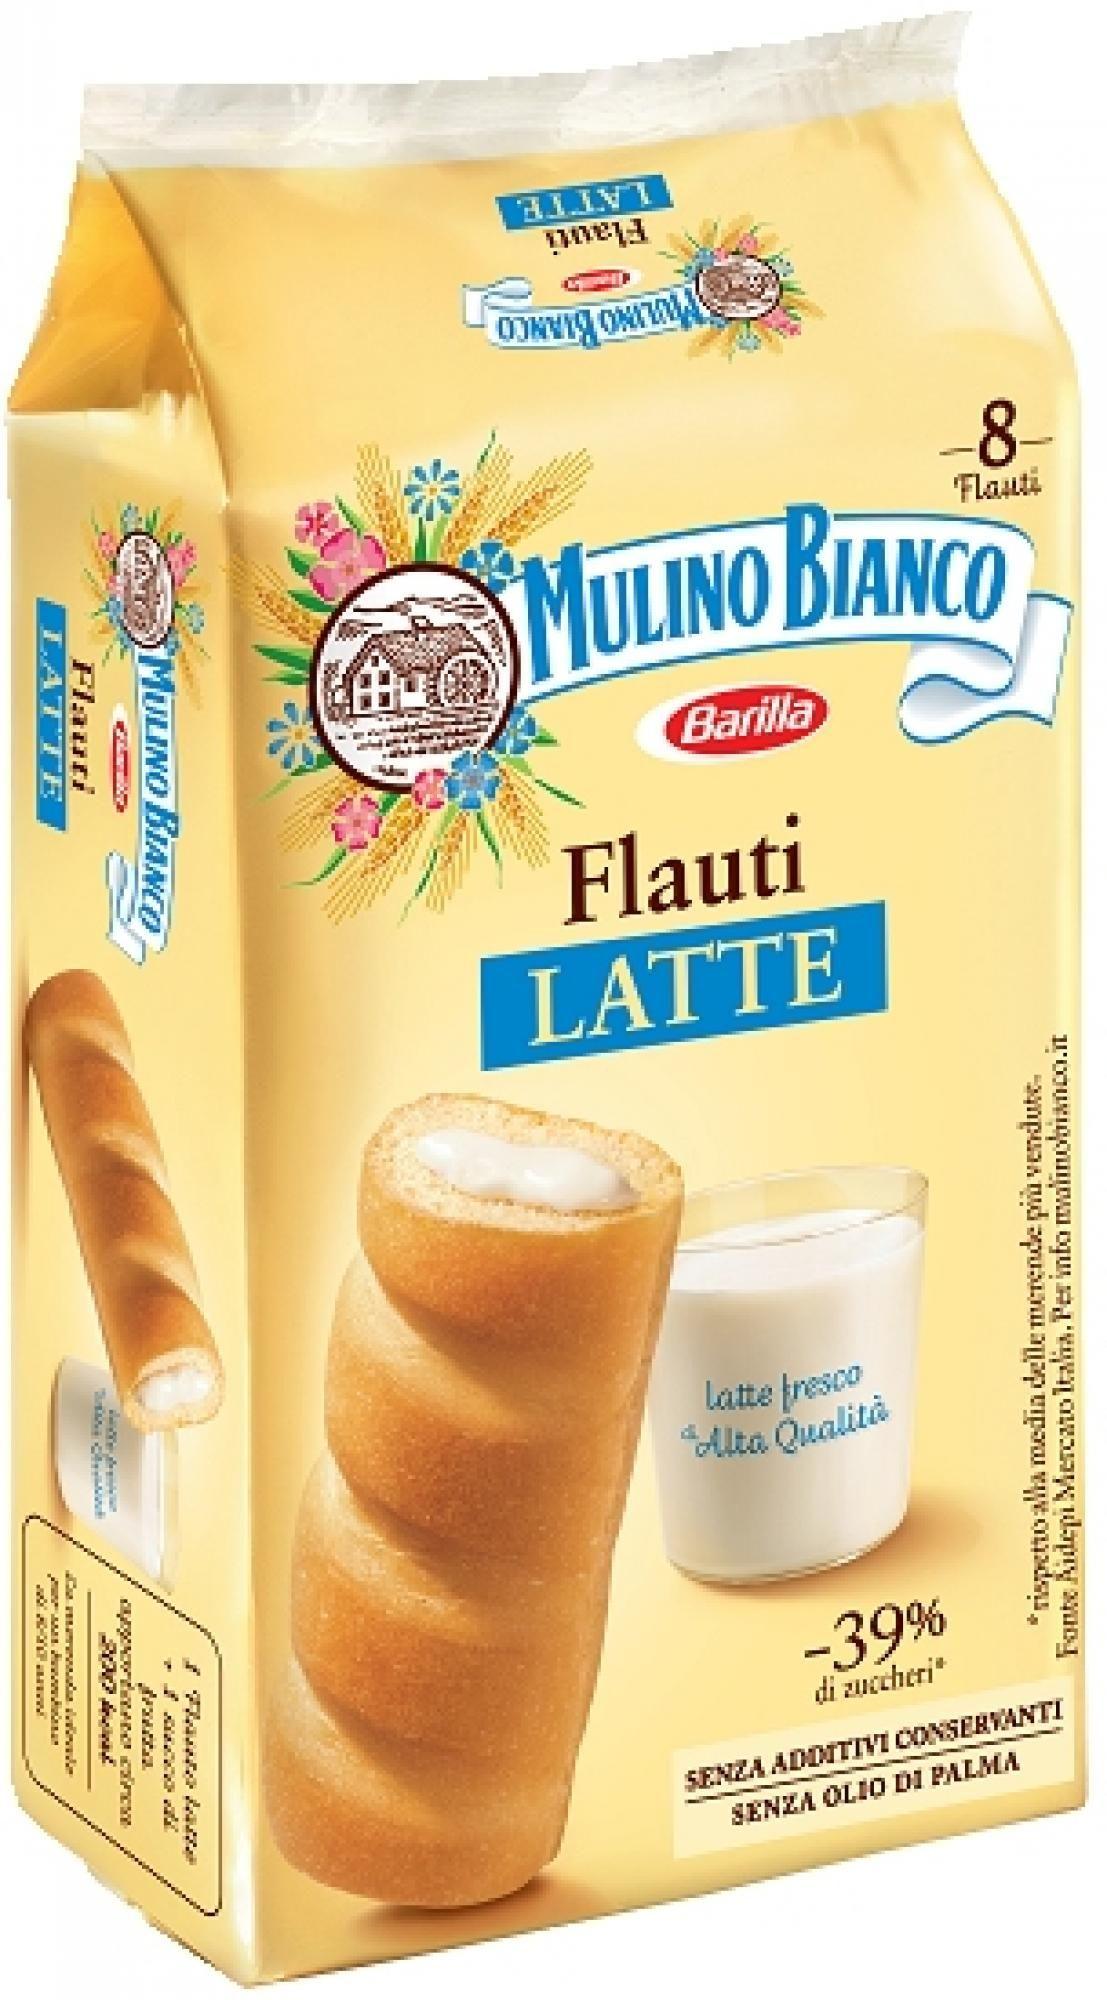 Flauti al latte Mulino Bianco 280g